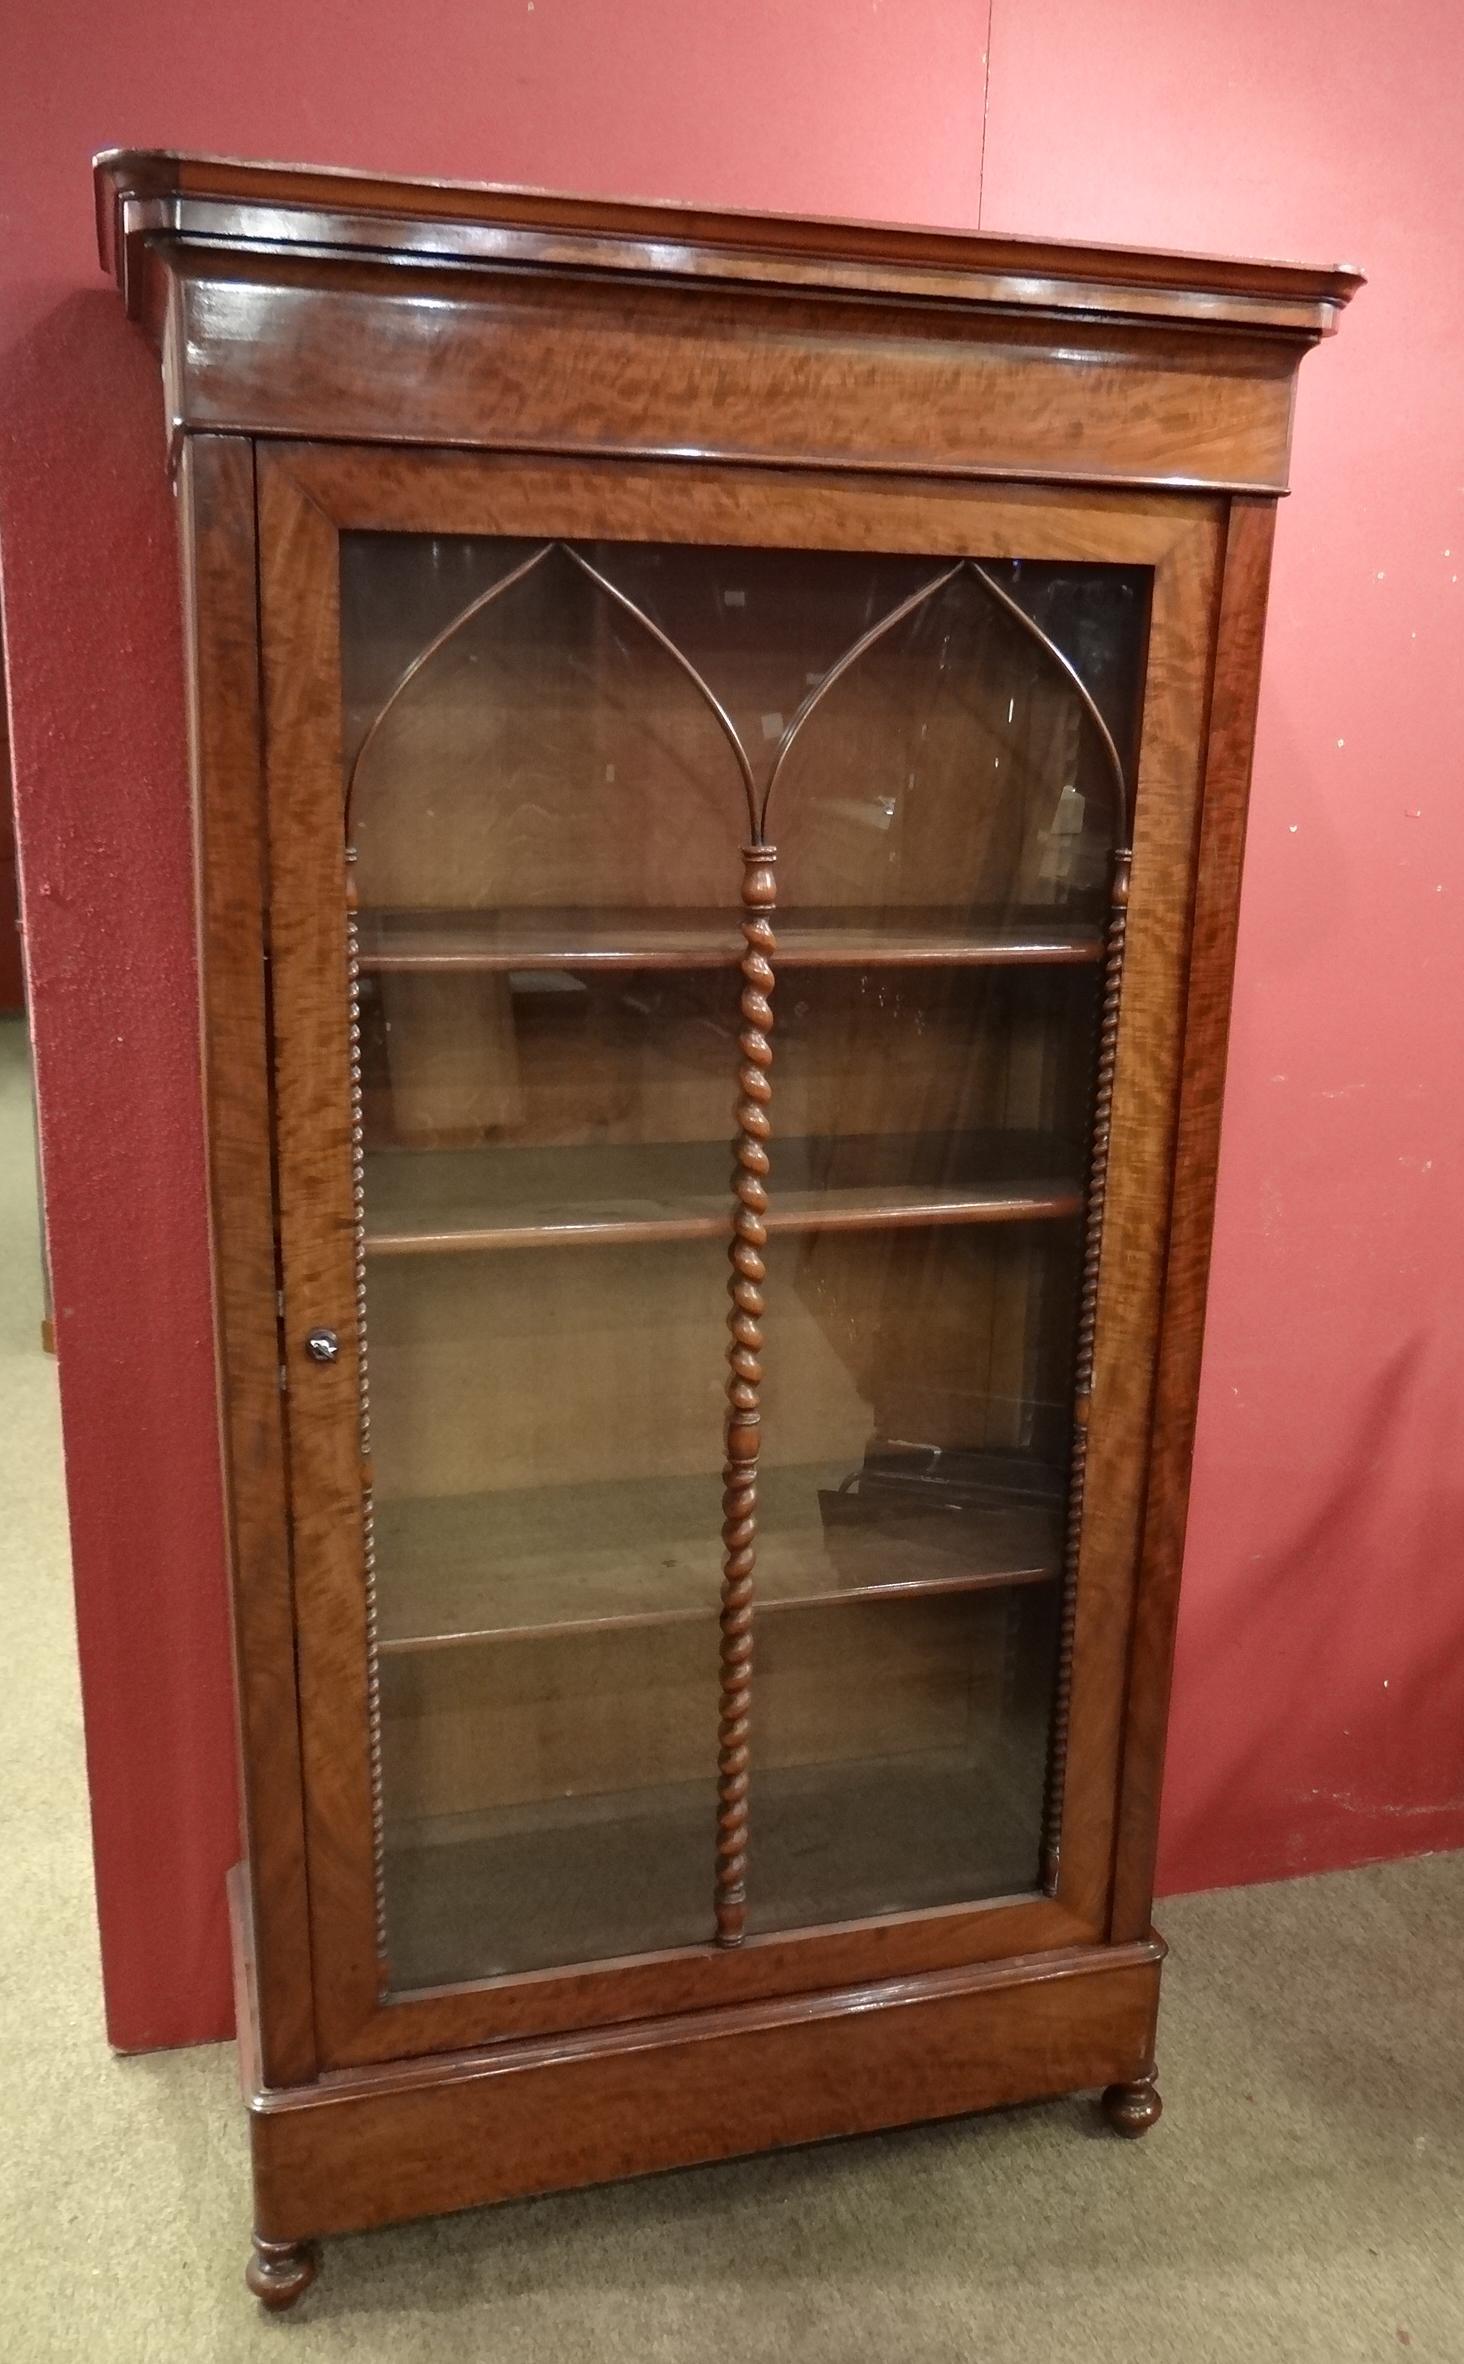 Meuble biblioth que vitr e charles x en ronce d 39 acajou Meuble bibliotheque vitree